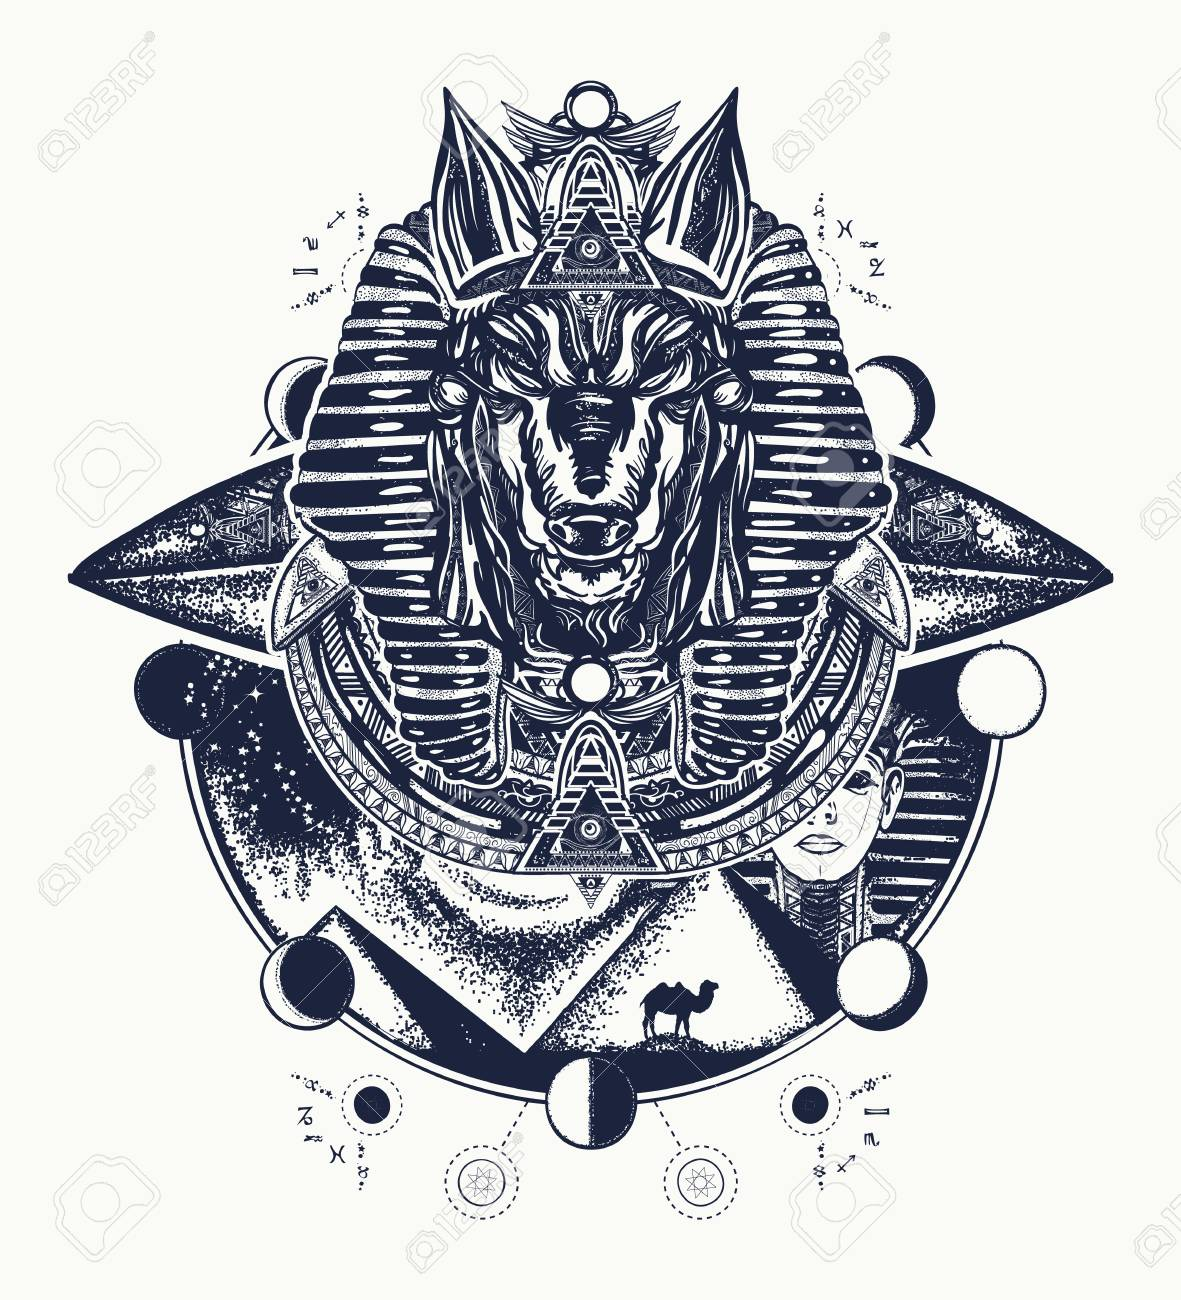 https://previews.123rf.com/images/intueri/intueri1801/intueri180100071/92828385-anubis-tattoo-and-t-shirt-design-anubis-god-of-war-golden-mask-of-the-pharaoh-egypt-tattoo-art-paleo.jpg